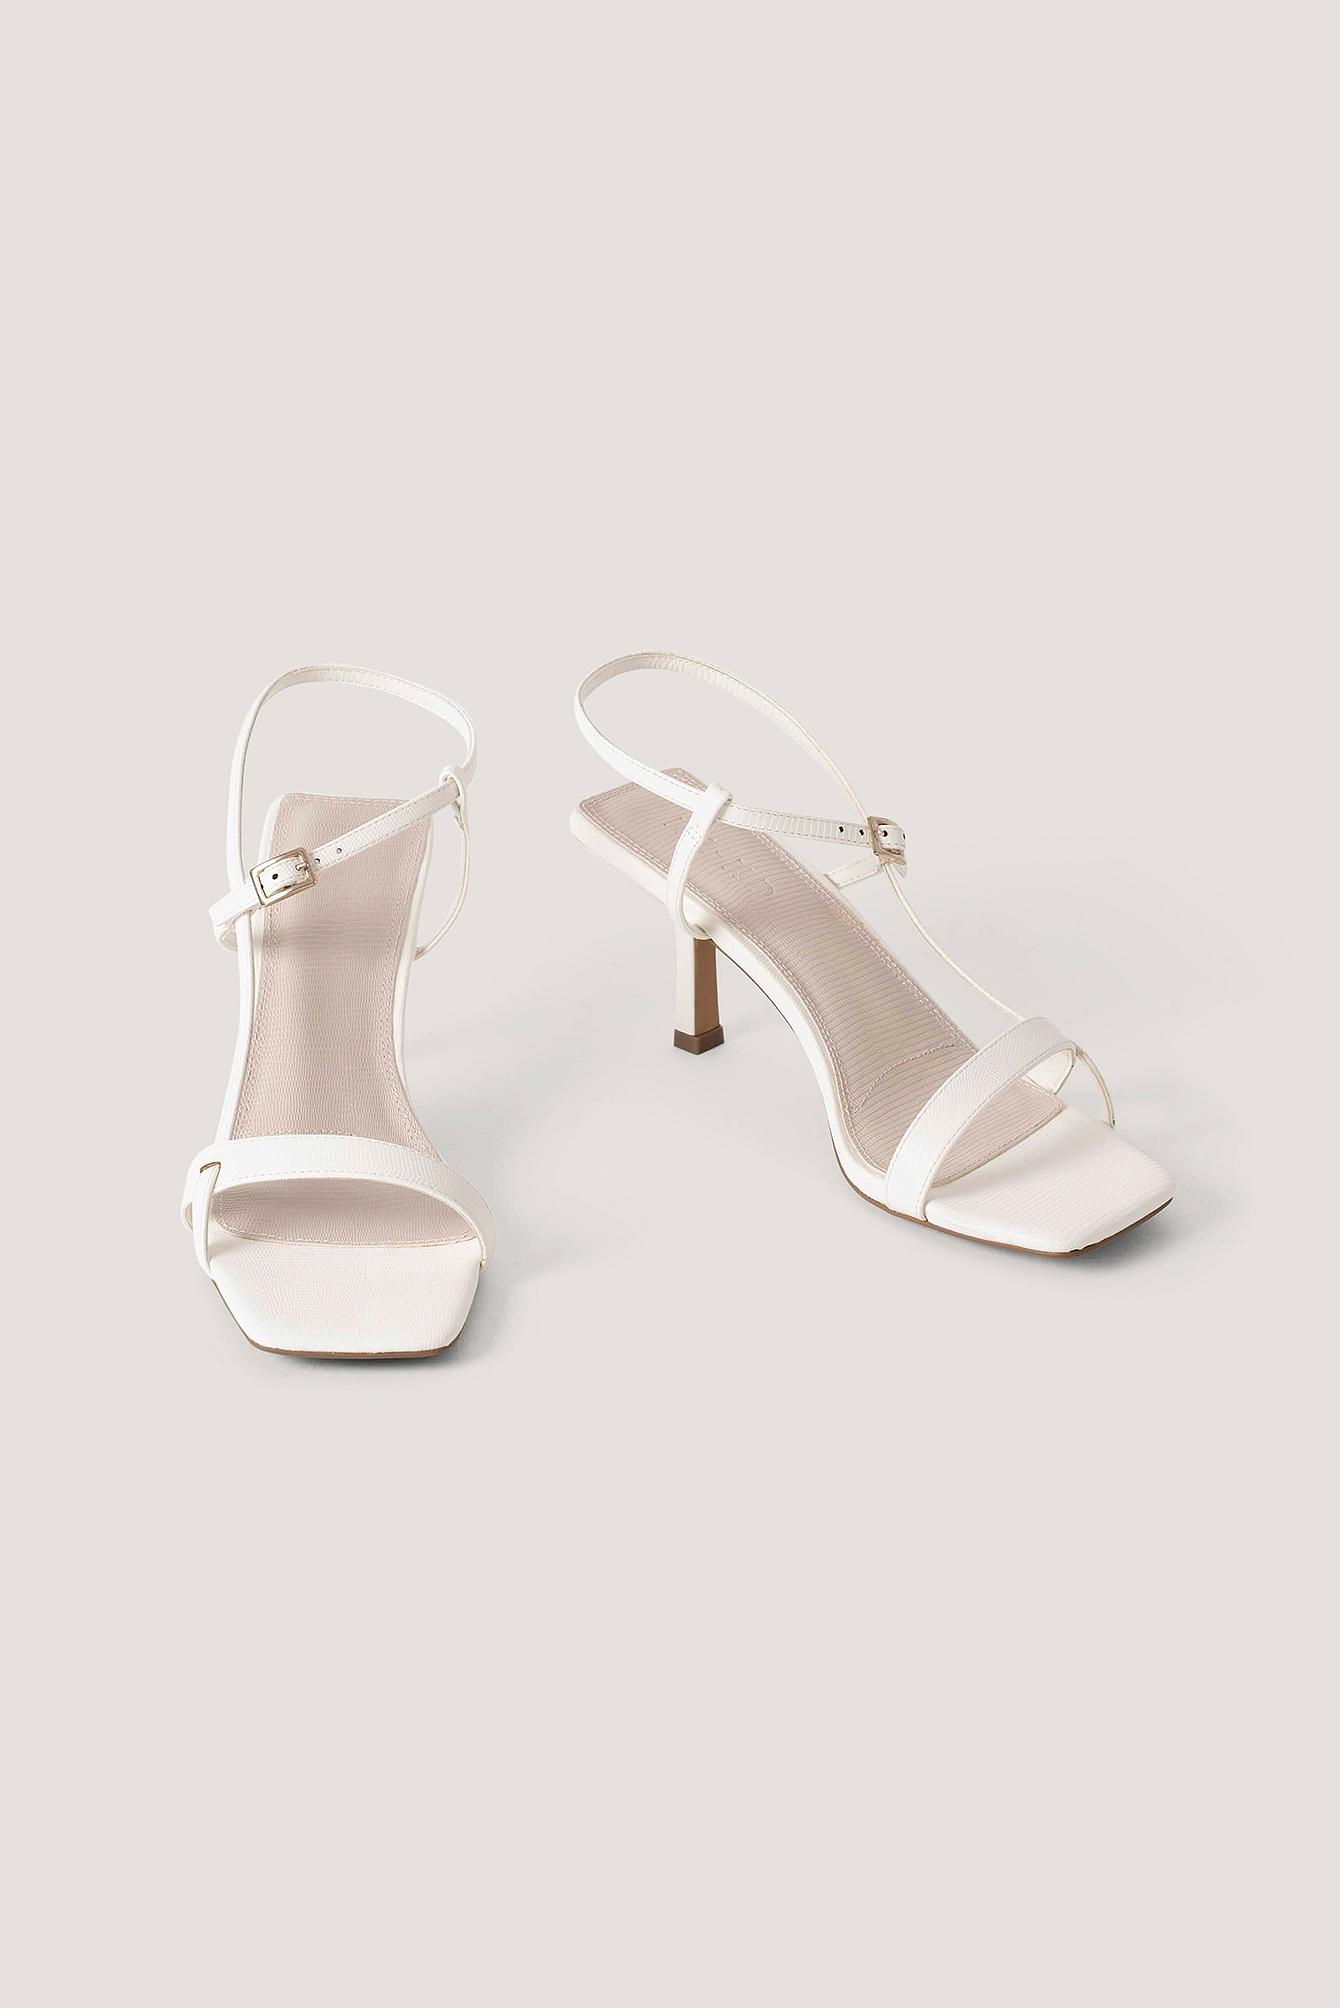 na-kd shoes -  Multischnalle Quadratisch - White